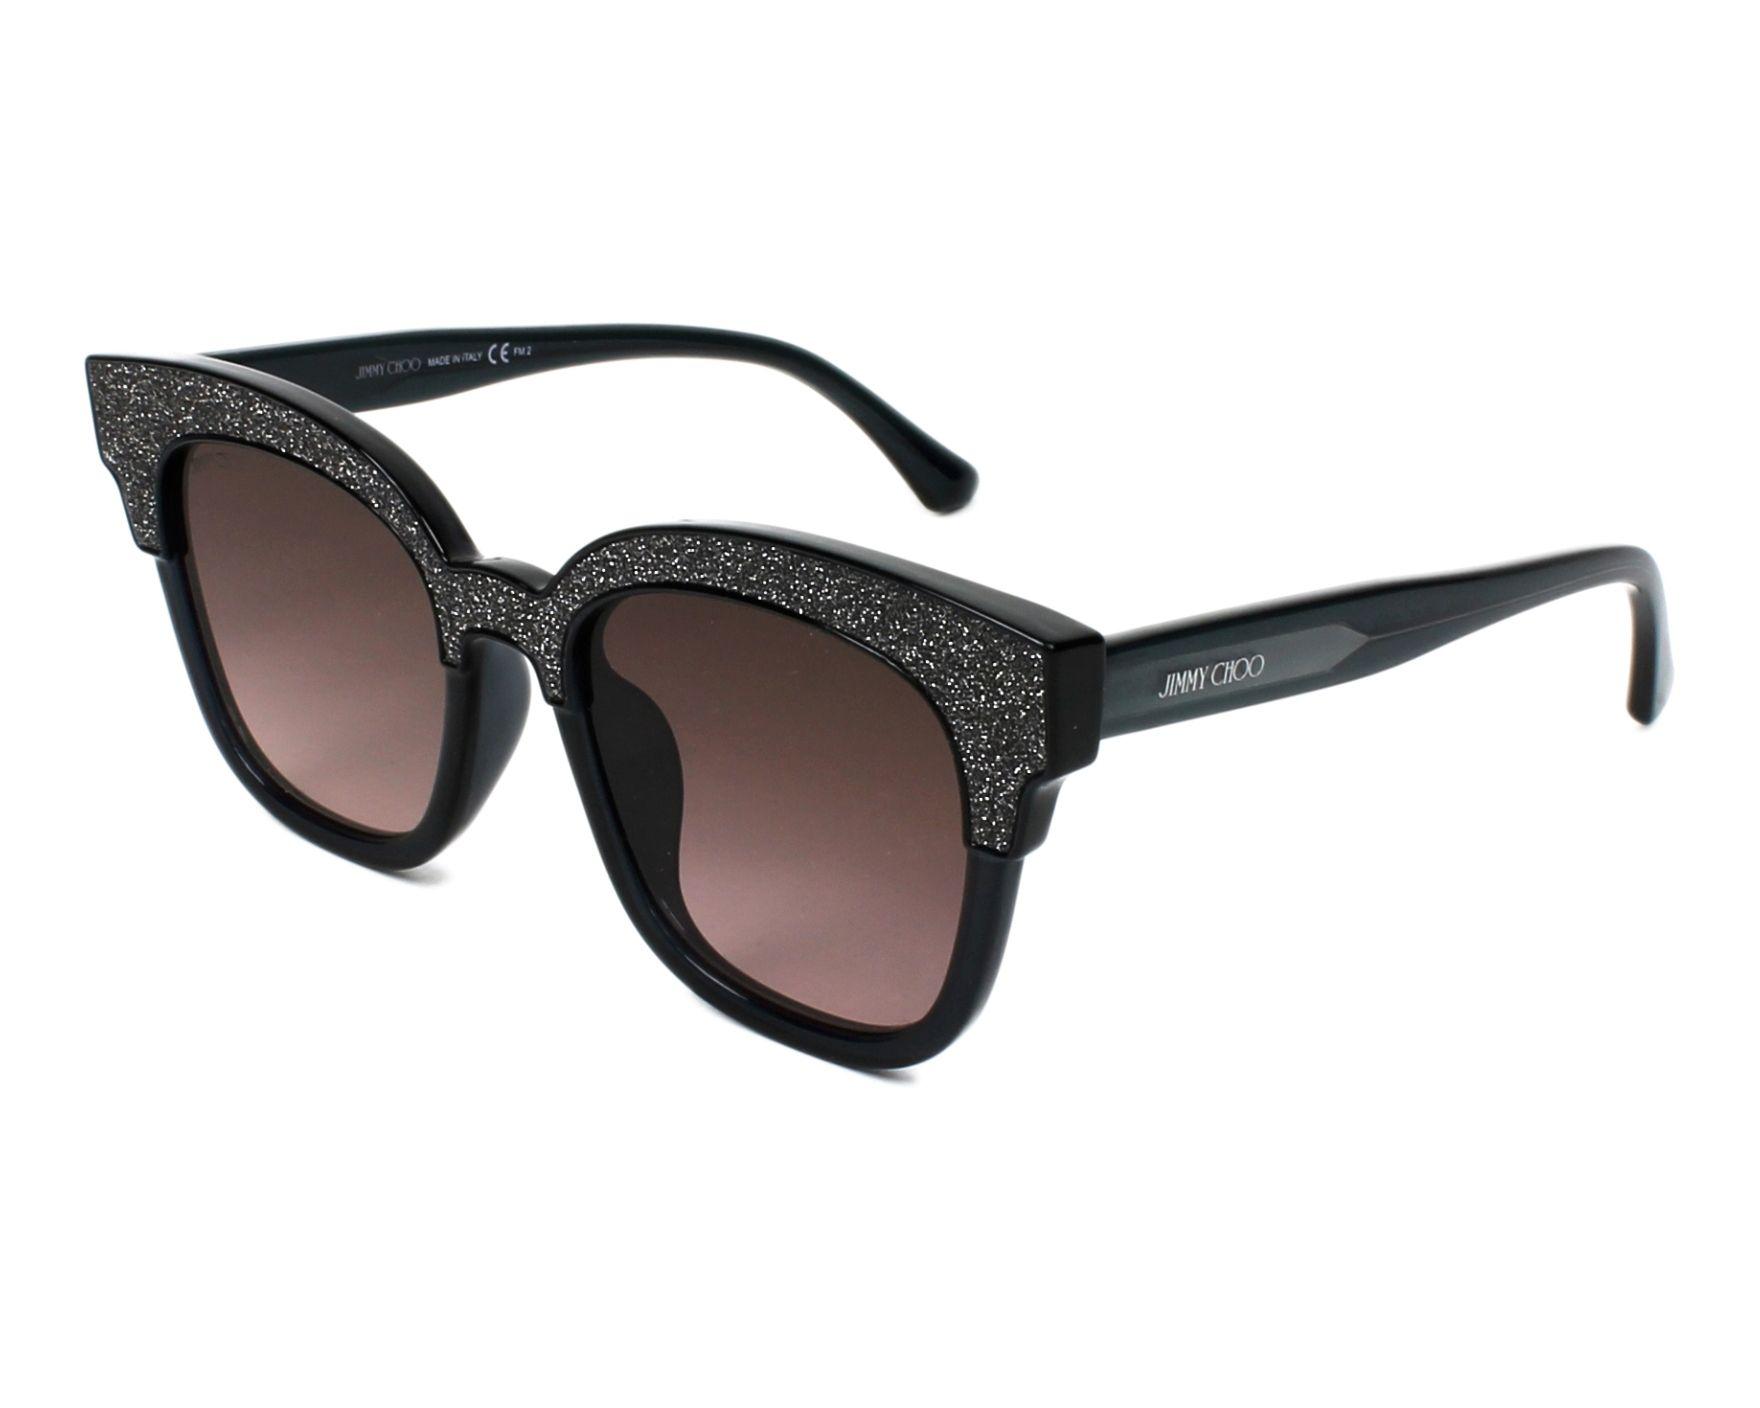 75b408630d6 Sunglasses Jimmy Choo MAYELA-S 18R VE 50-19 Silver Black profile view